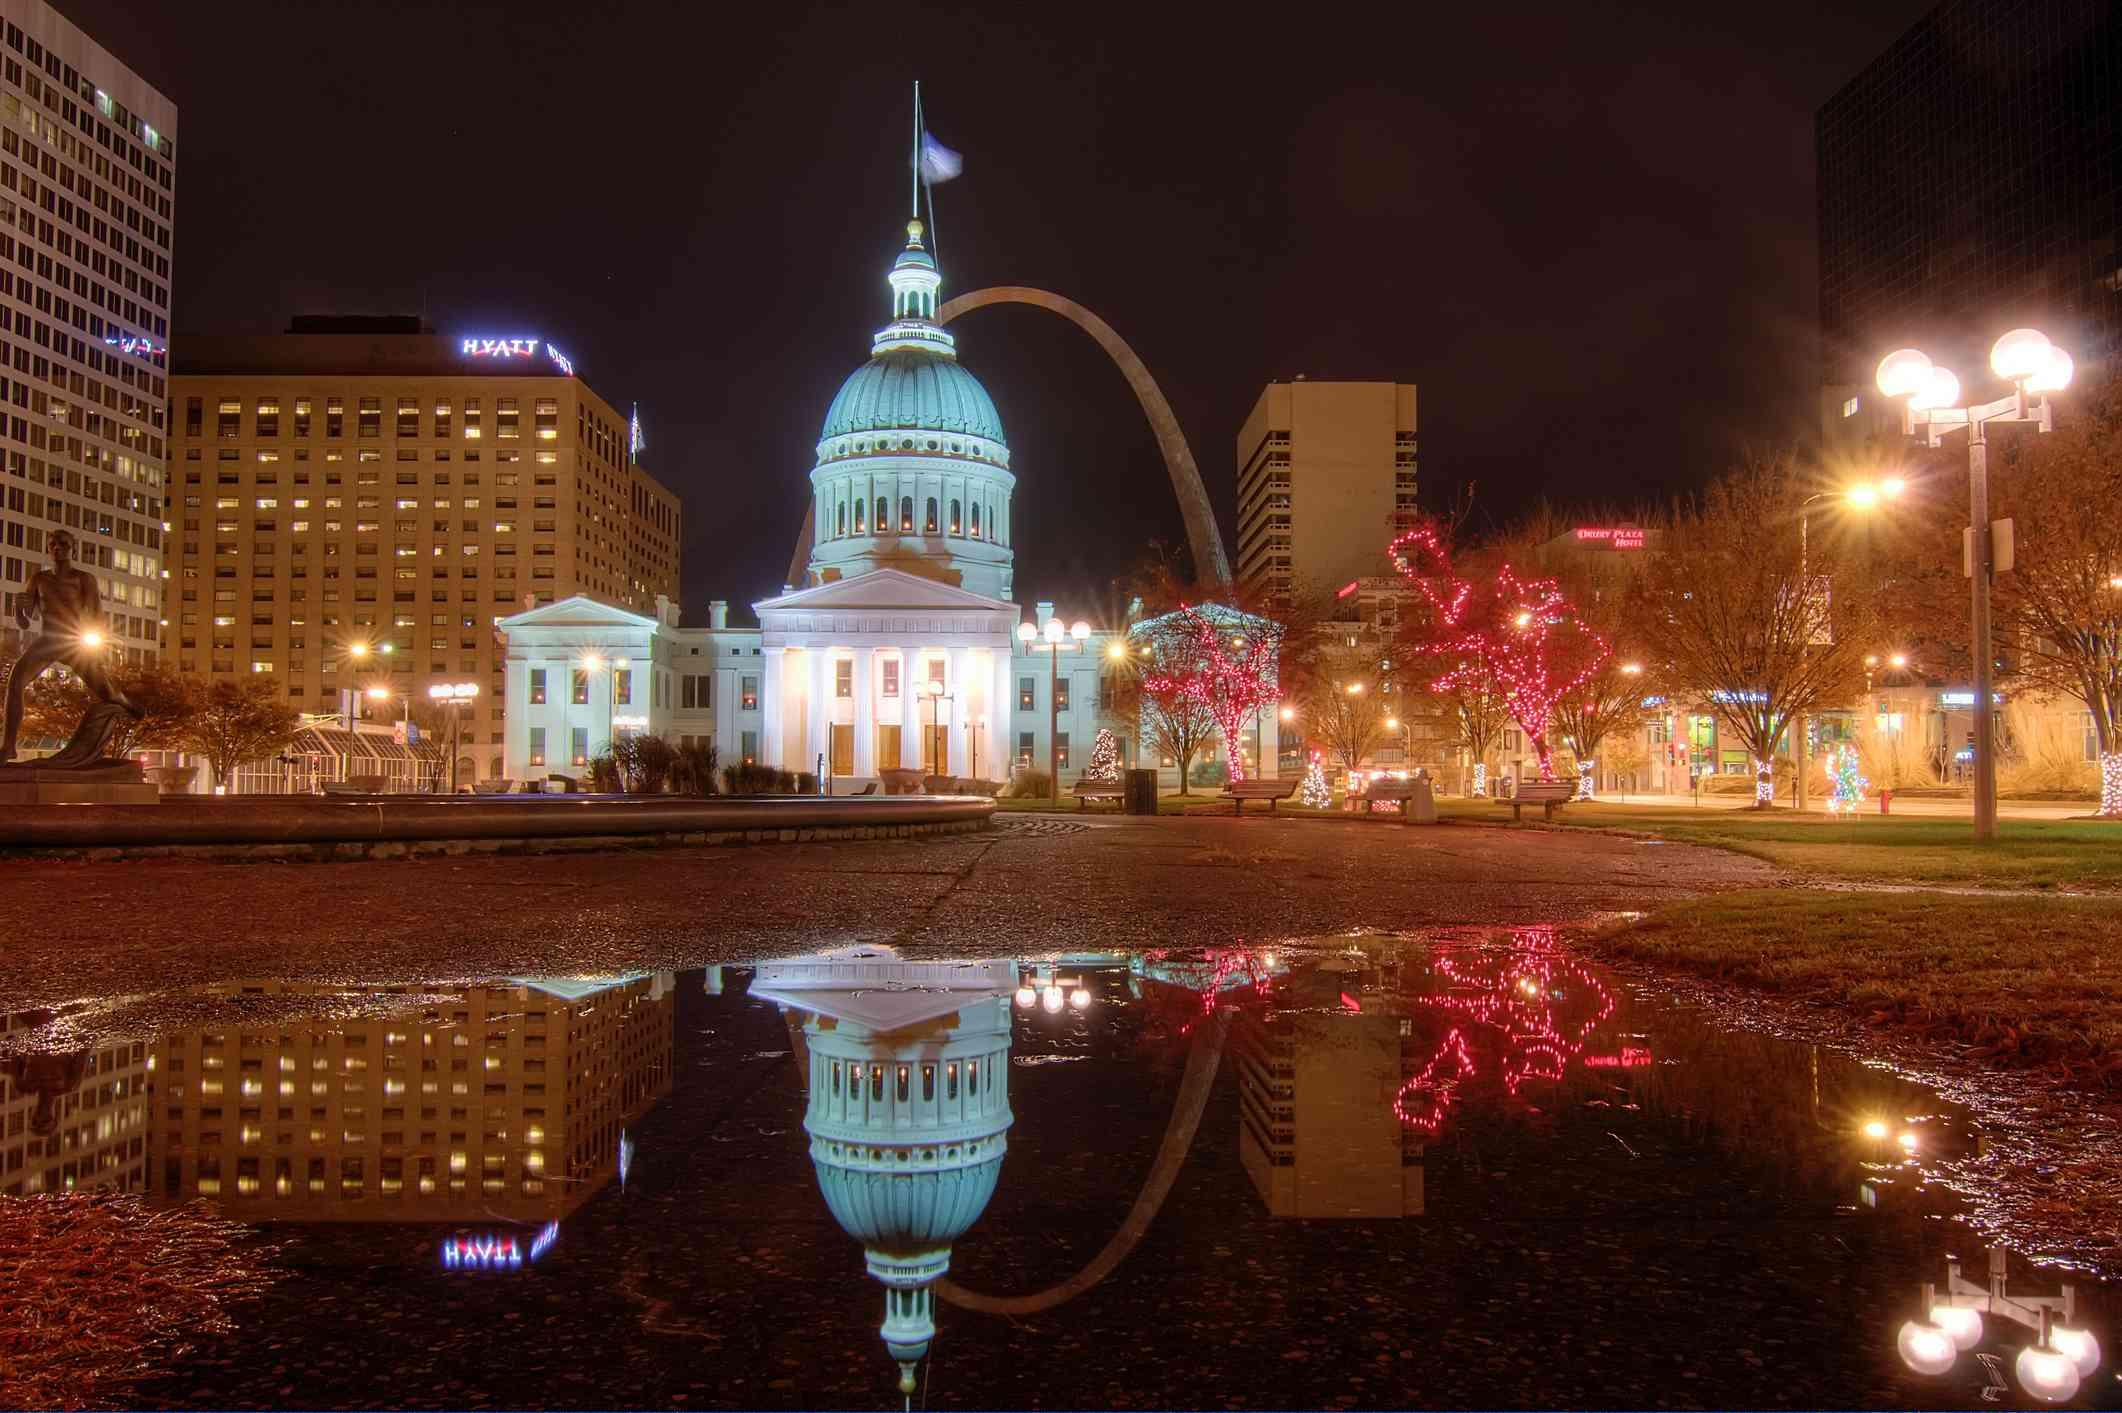 Things To Do On Christmas Eve 2021 Botanical Gardens St.Louis Things To Do For Christmas In St Louis